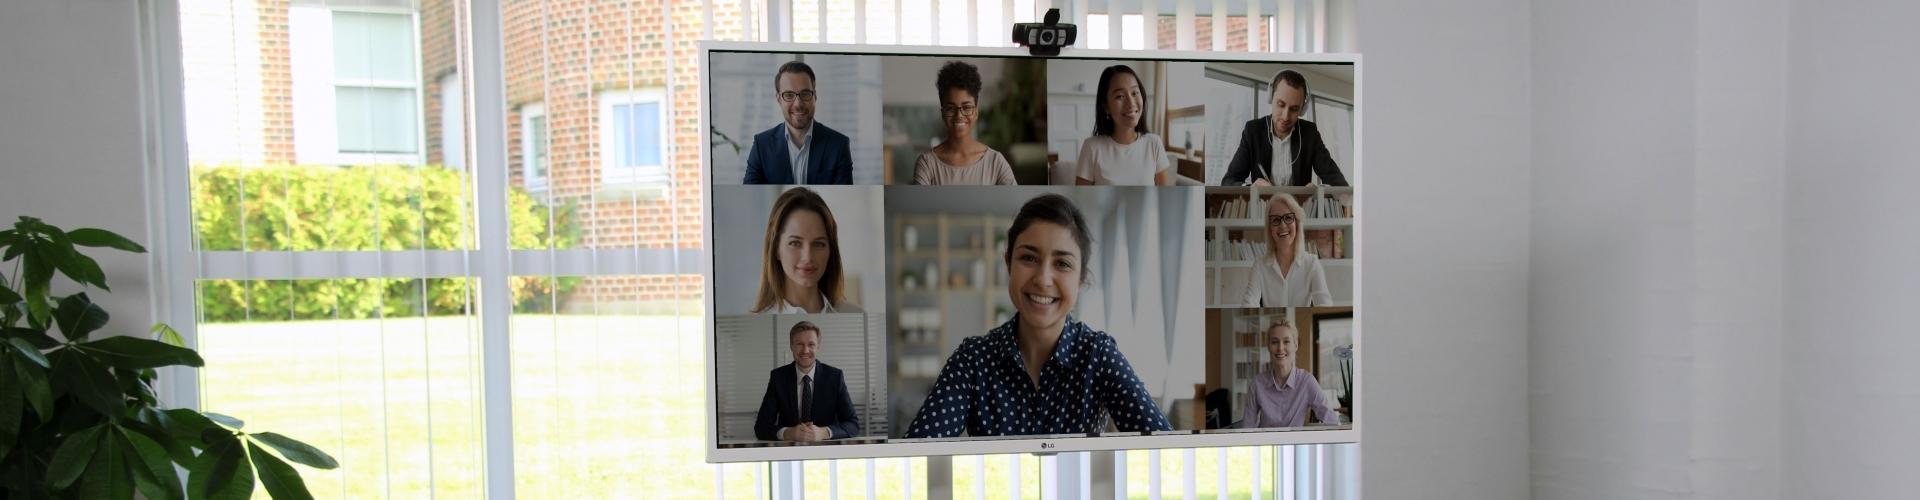 Virtuel Meeting System